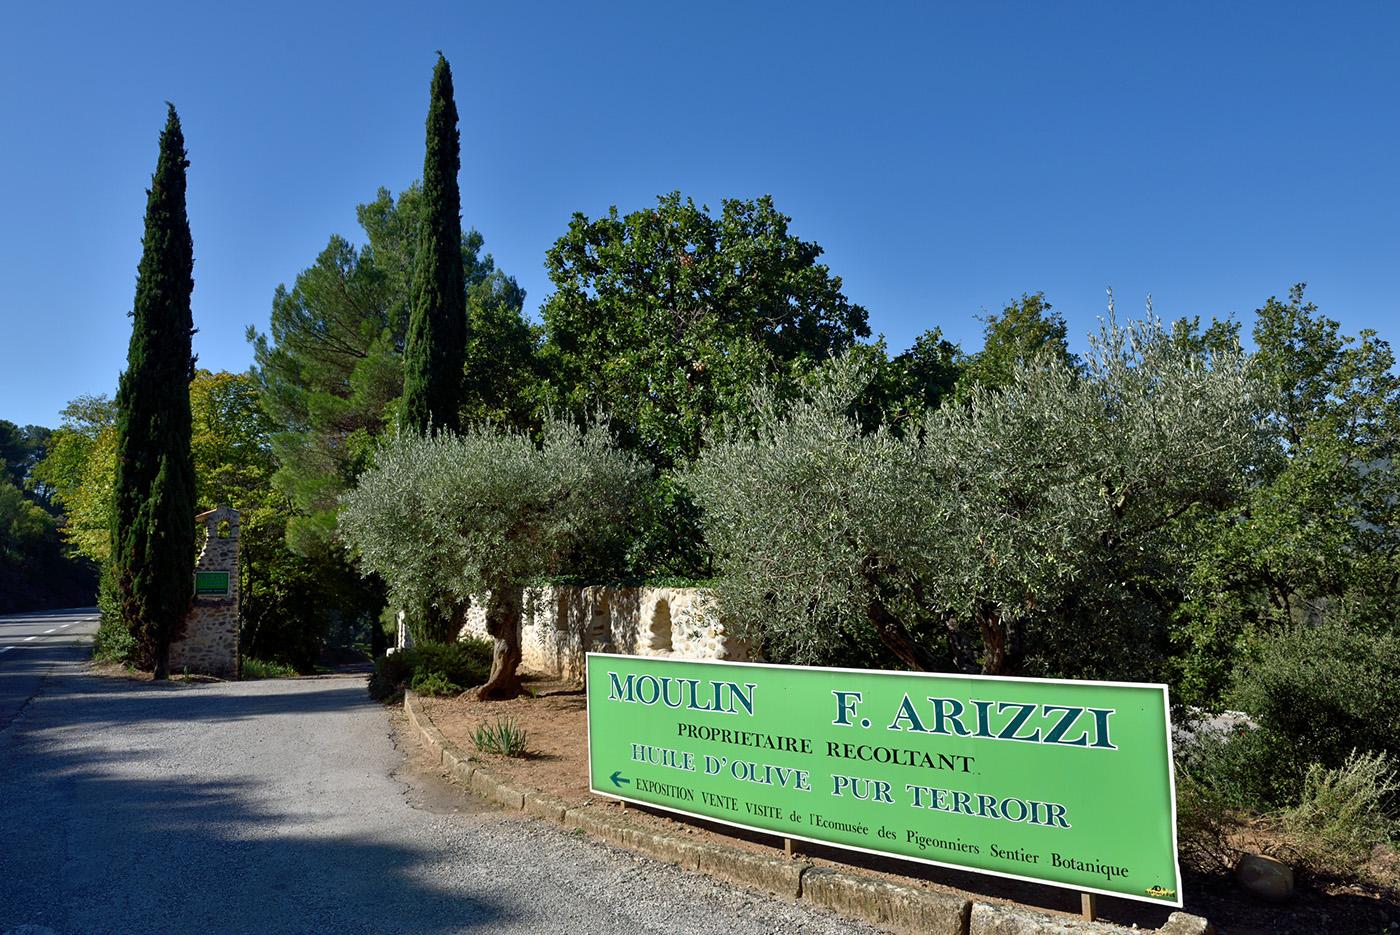 Moulin Arizzi